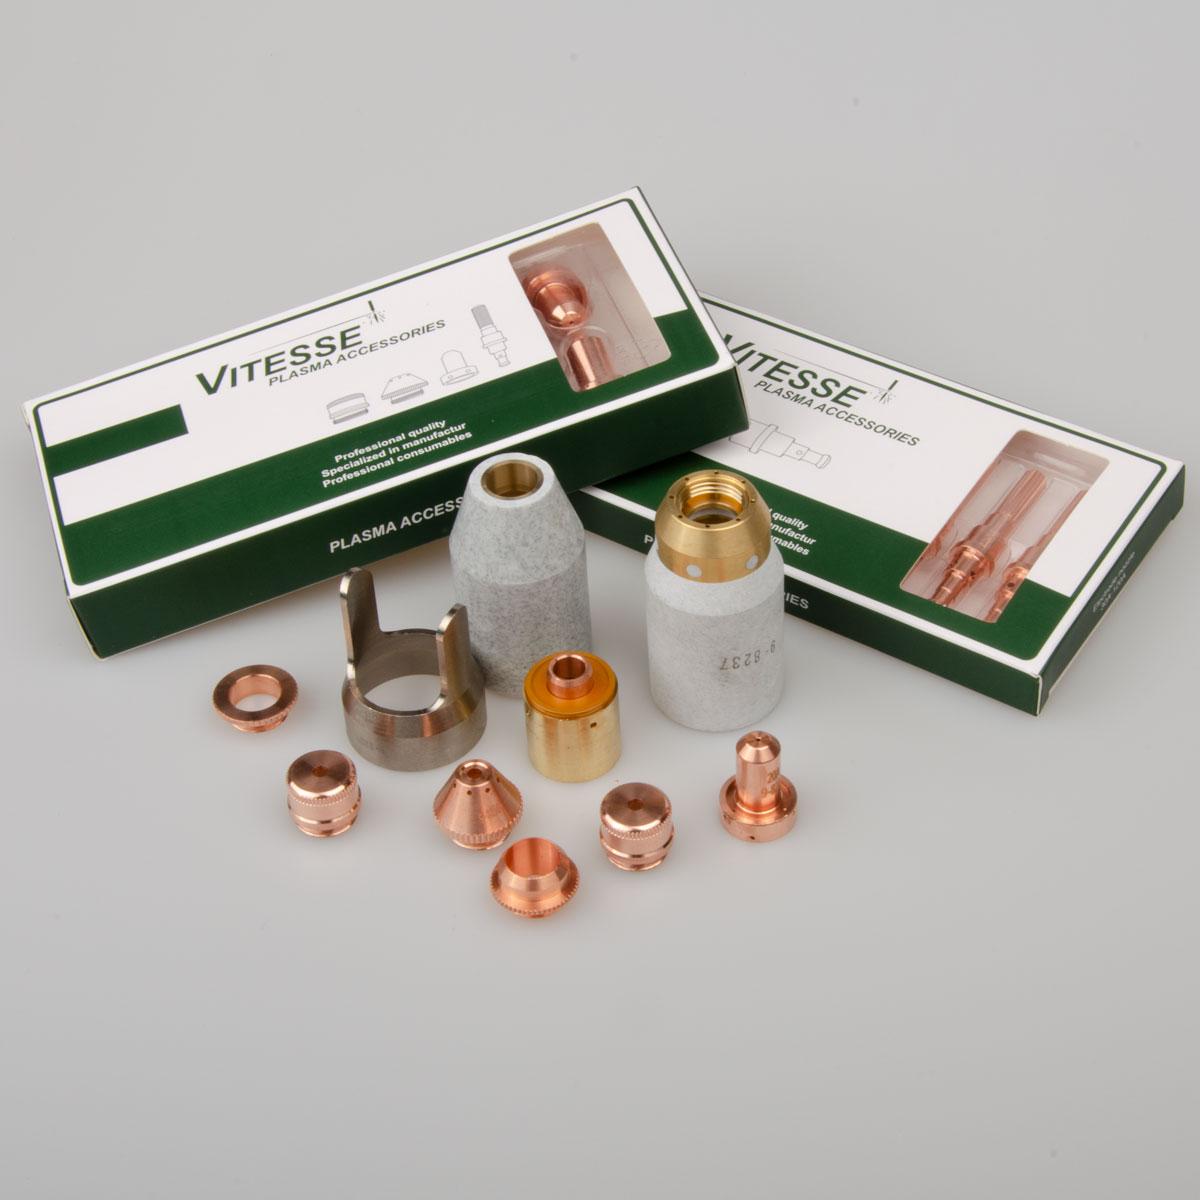 Thermal Dynamics Plasma Tips Nozzle Electrode Start Cartridge Cutter SL60/SL100 Torch 9-8205 9-8206 9-8207 9-8215 9-8232 9-8210